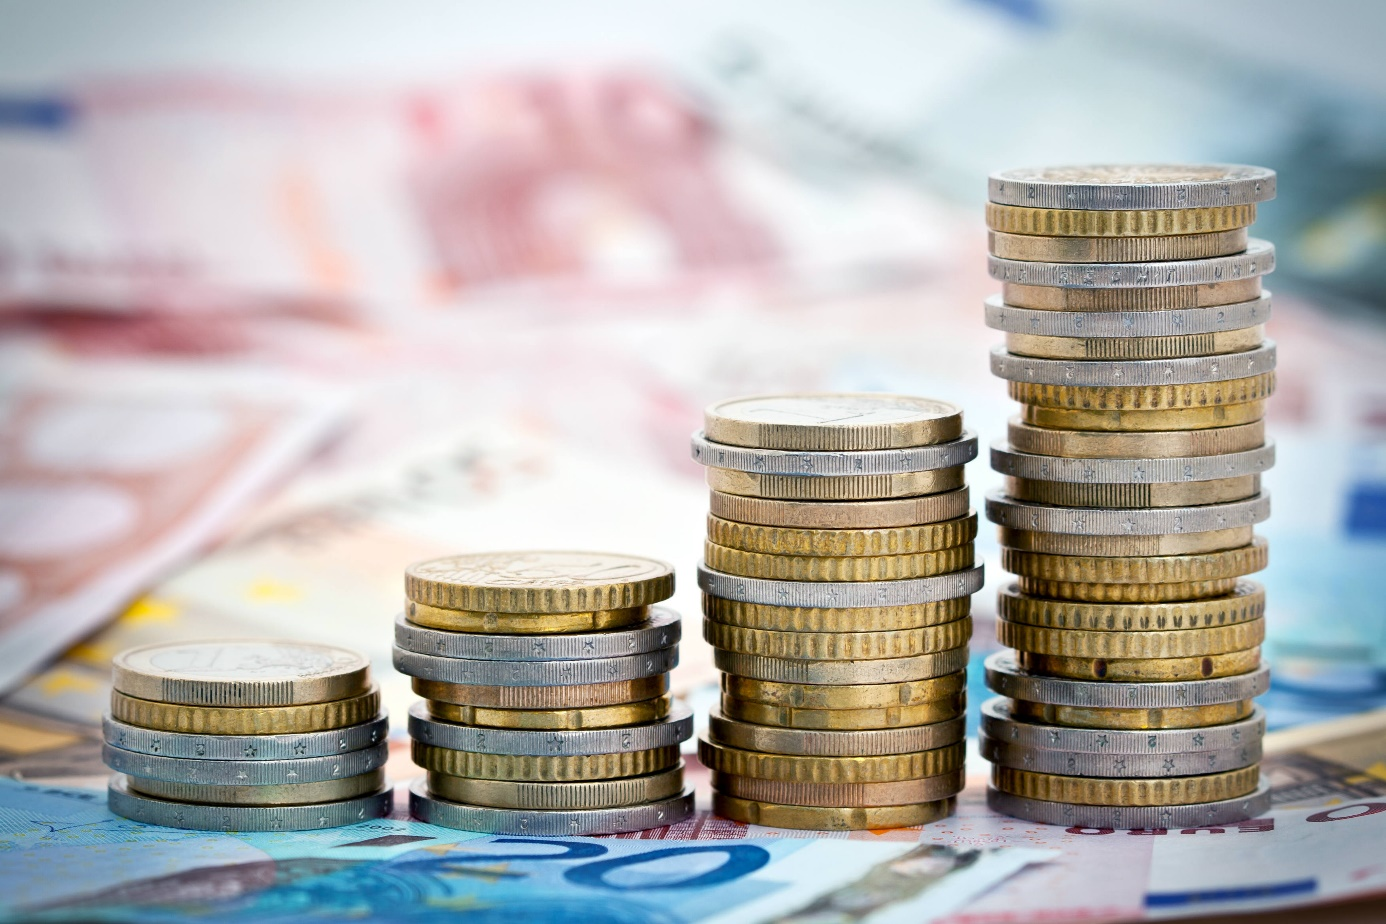 changer de banque boursorama